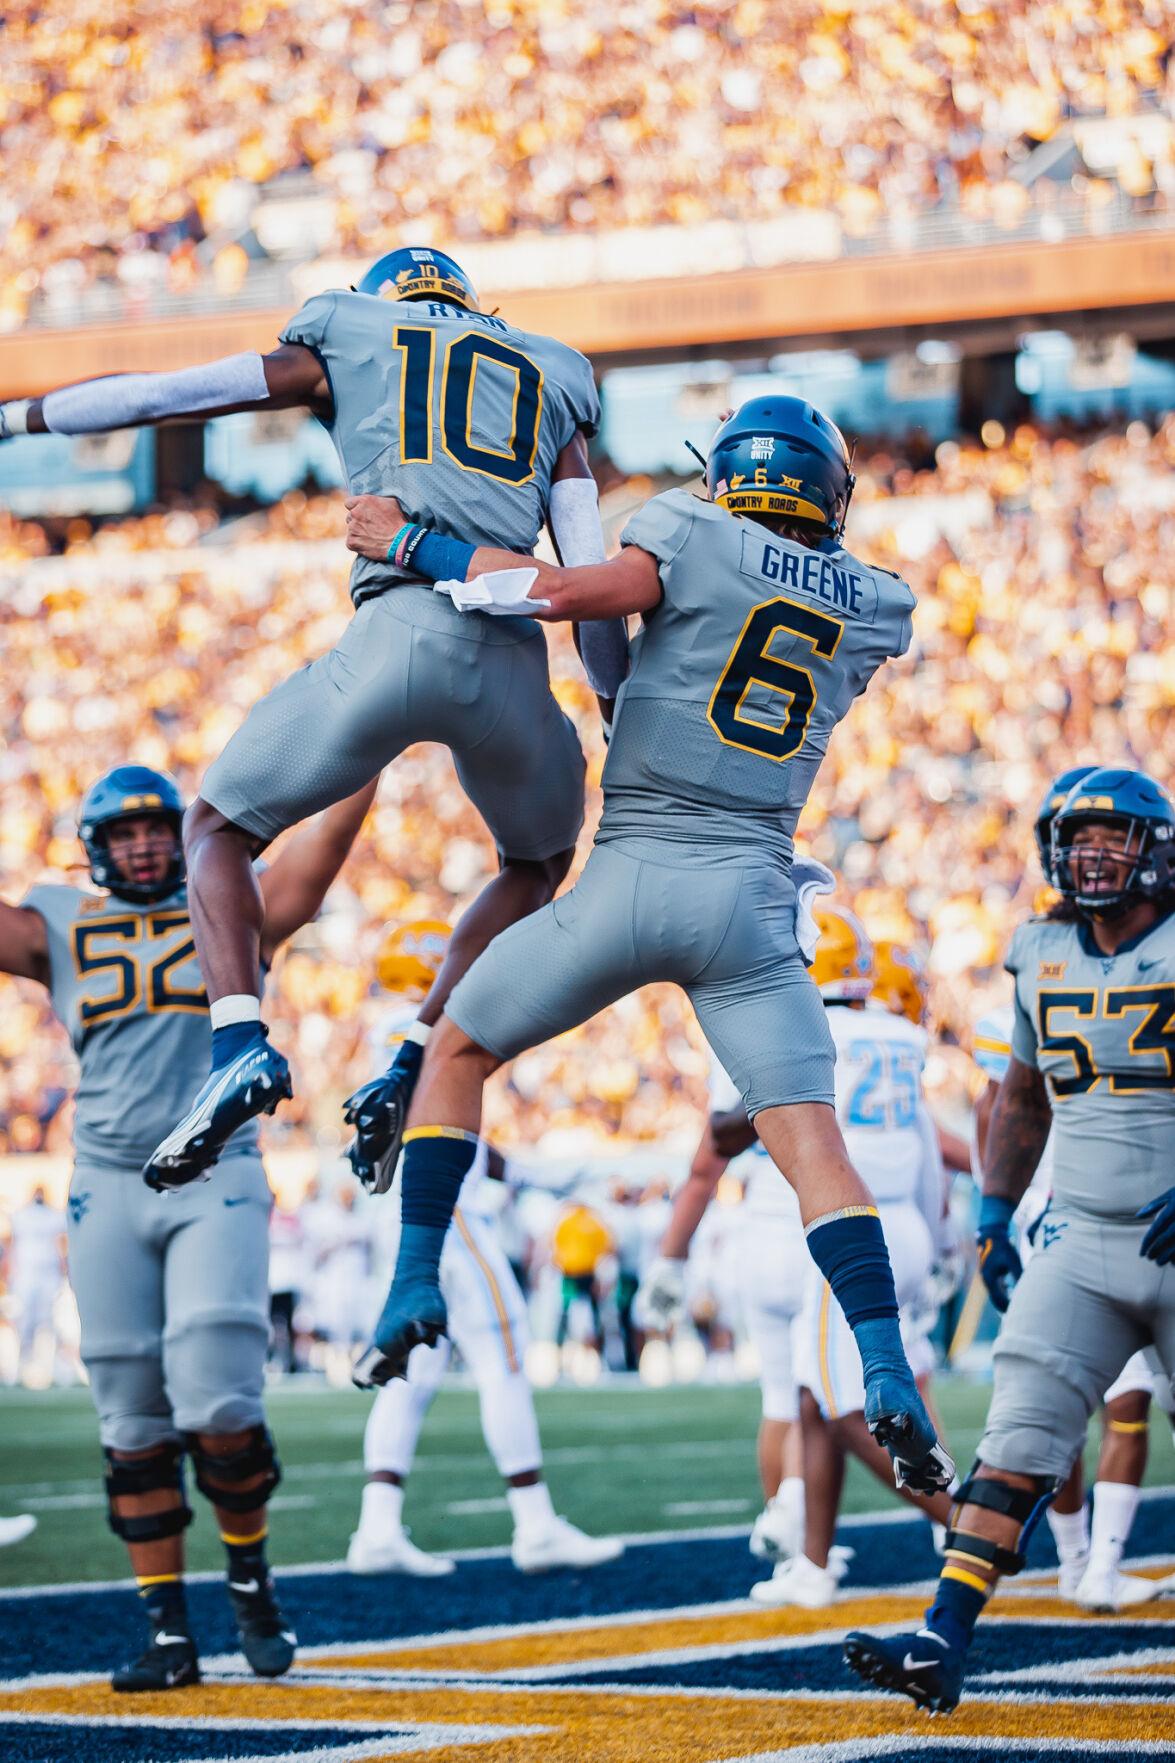 West Virginia quarterback Garrett Greene (6) and wide receiver Sean Ryan (10) celebrate following a touchdown against Long Island at Milan Puskar Stadium in Morgantown, W.Va., on Sept. 11, 2021.